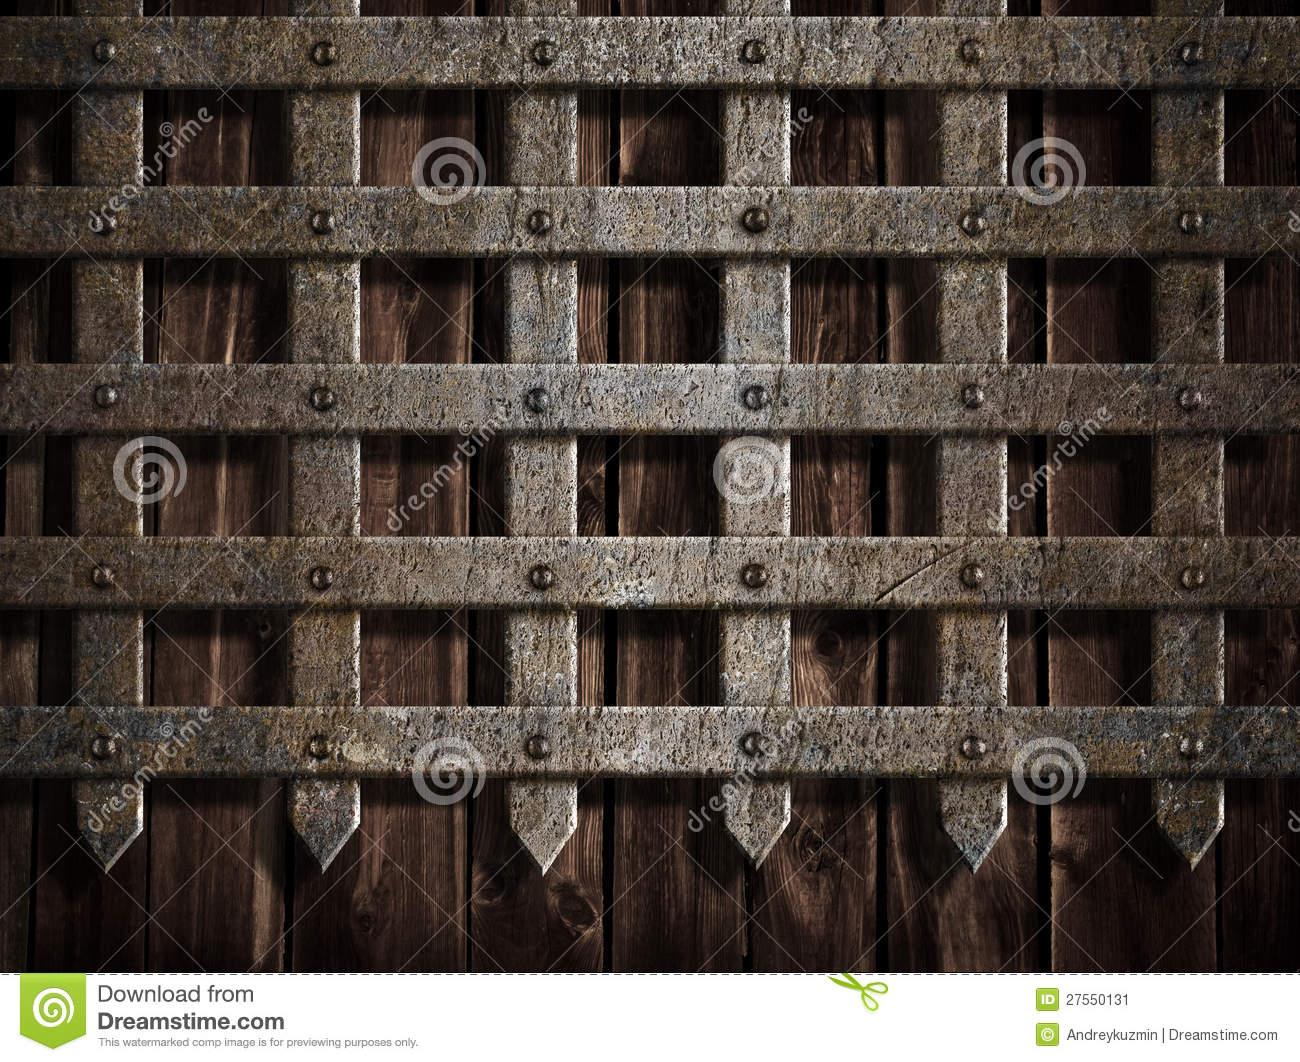 Castle Wall Clip Art Long Tail Keywords.